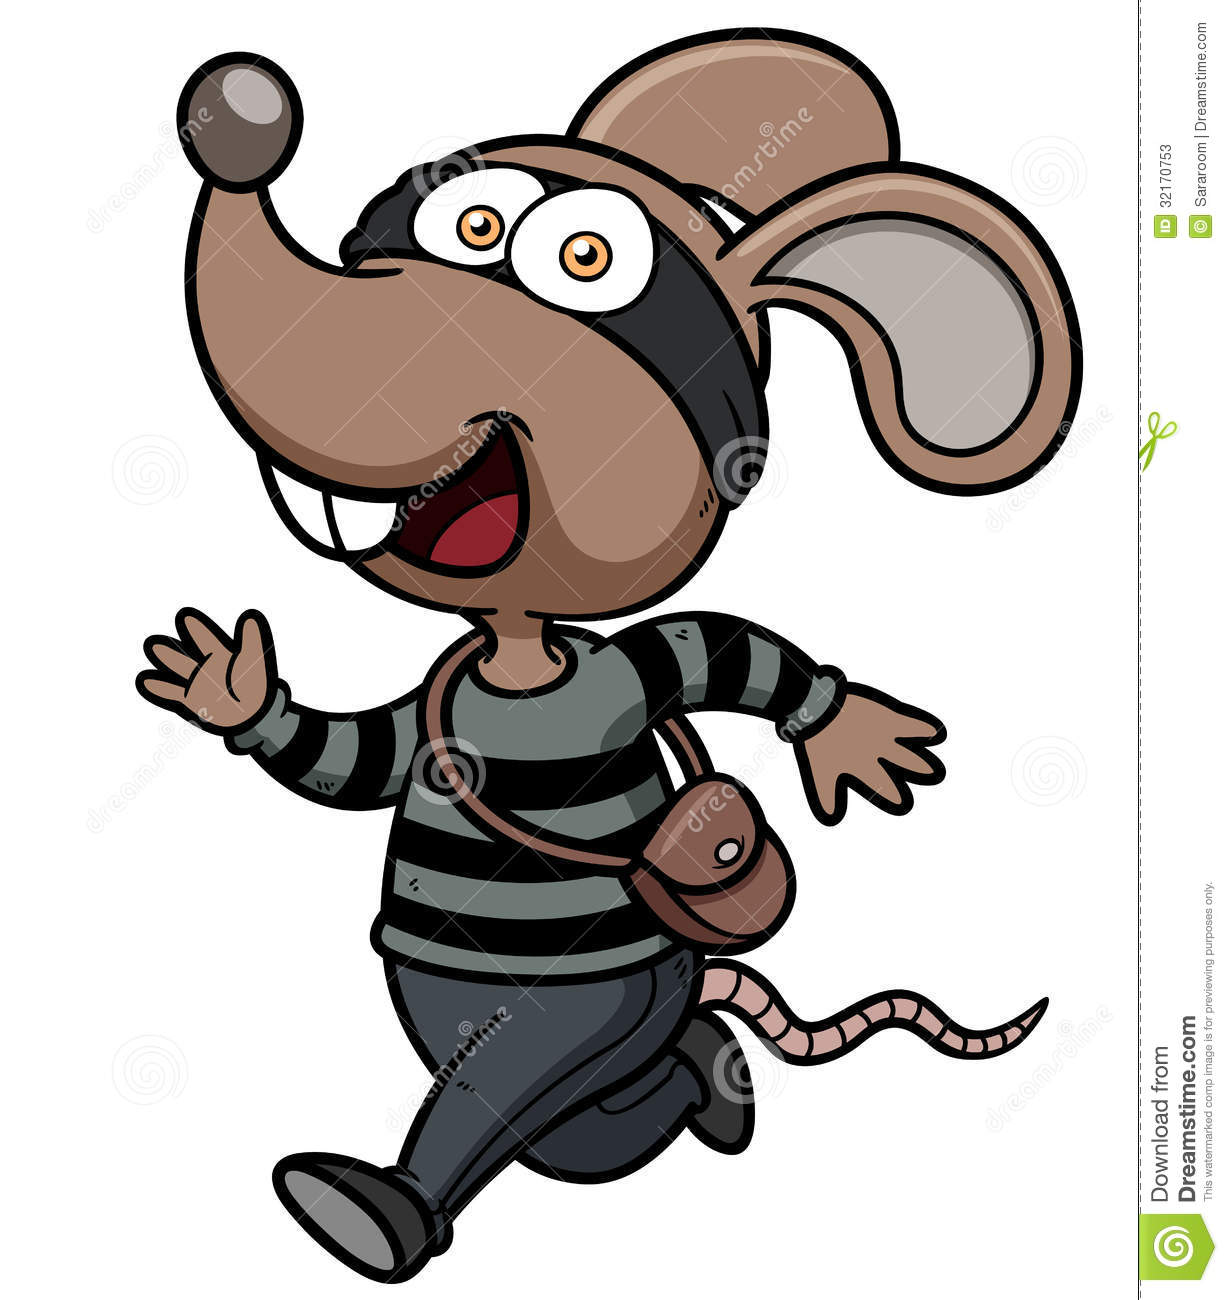 Burglar clipart cartoon.  collection of running